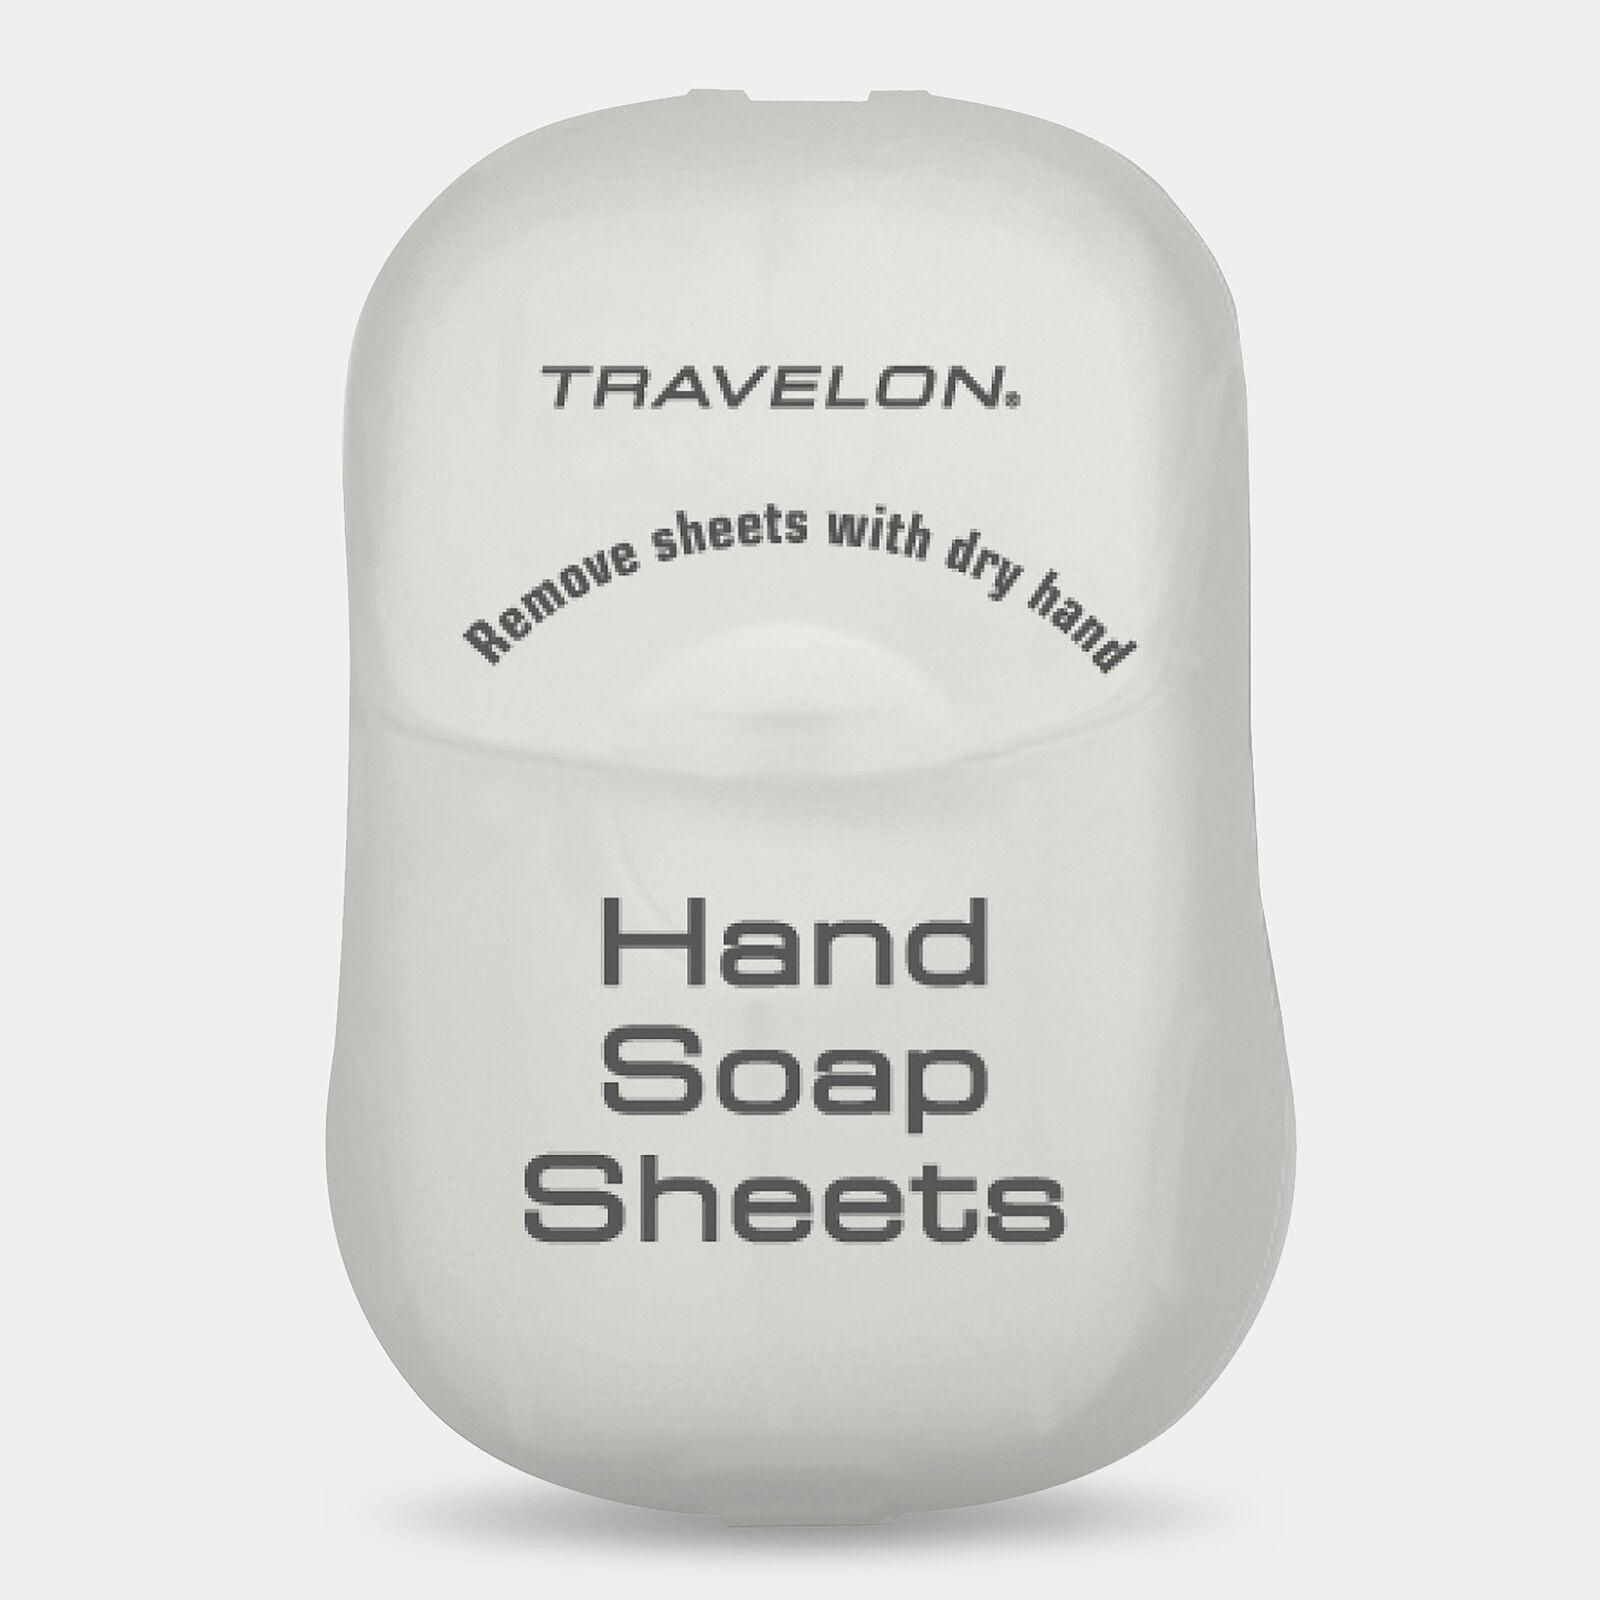 HAND SOAP SHEETS